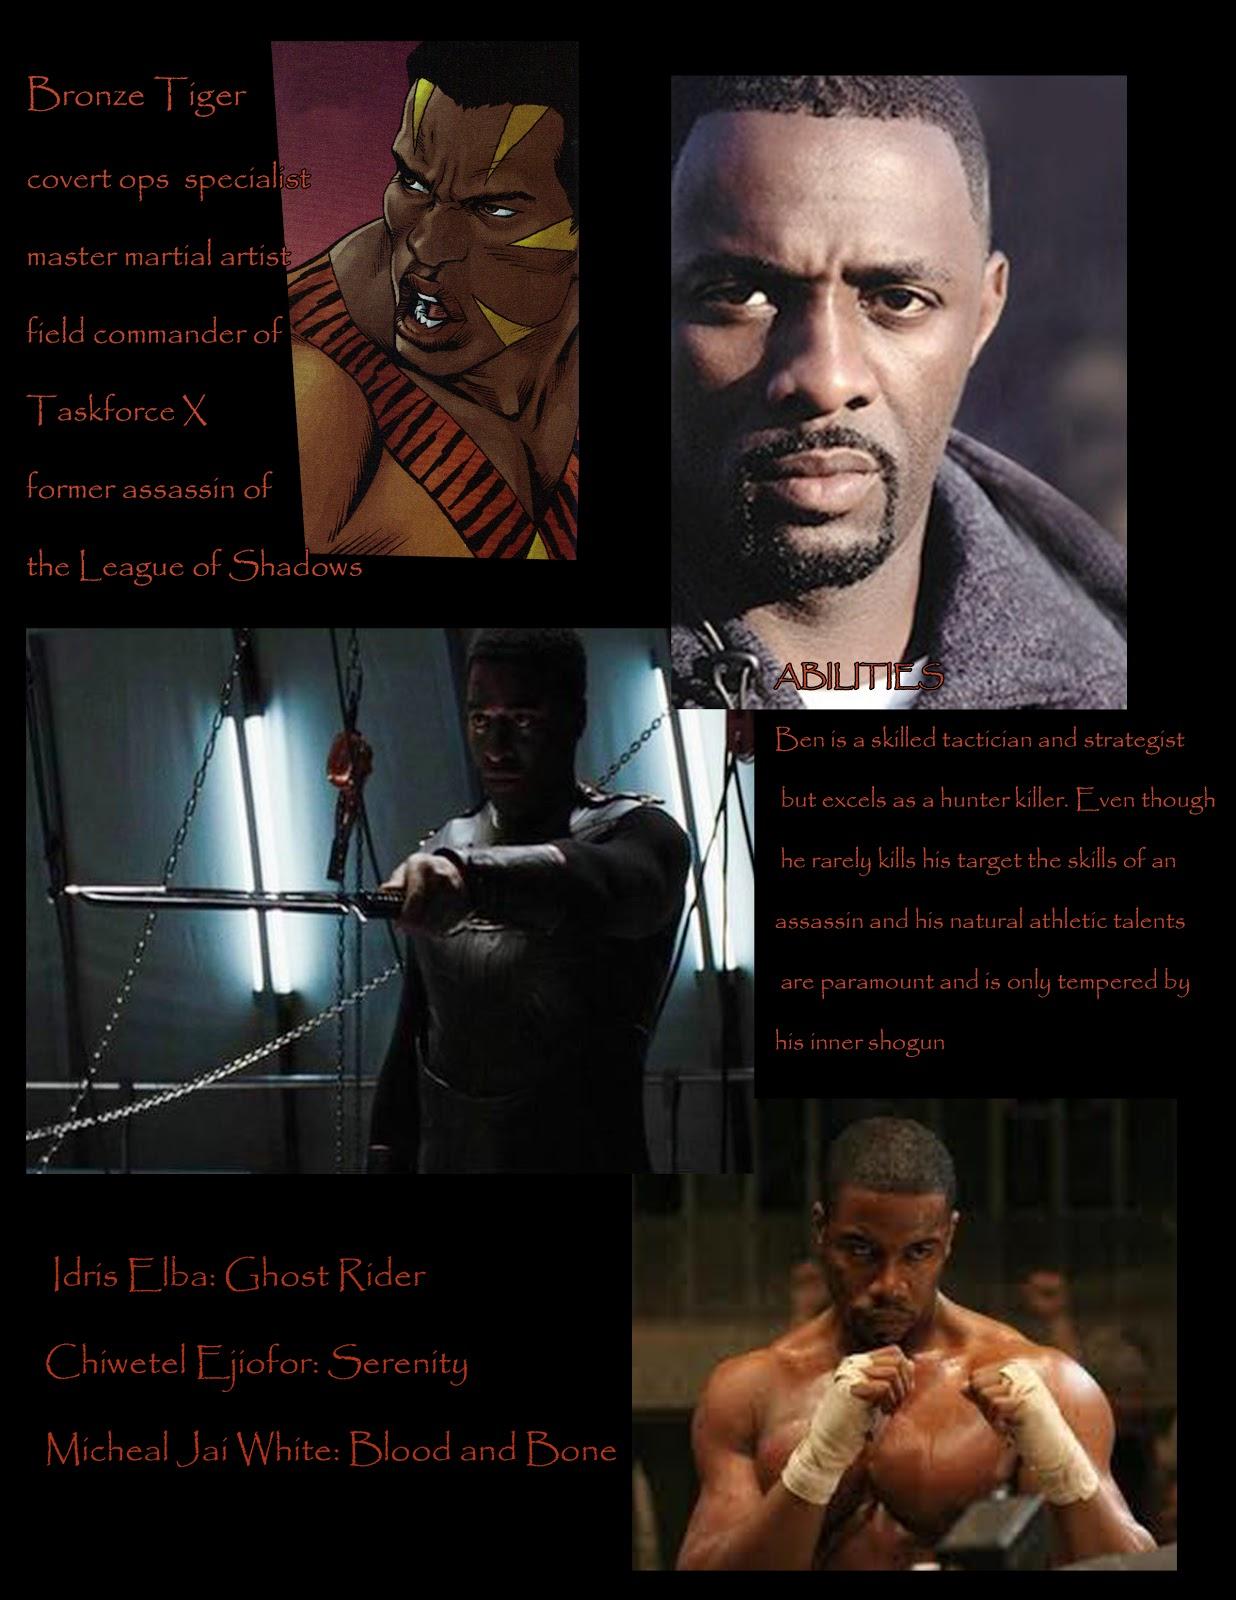 http://2.bp.blogspot.com/-uLcLxF025qw/ULUE7a_UEvI/AAAAAAAAA6E/V7_JGDrGfgQ/s1600/BronzeTiger_BlackActors.jpg